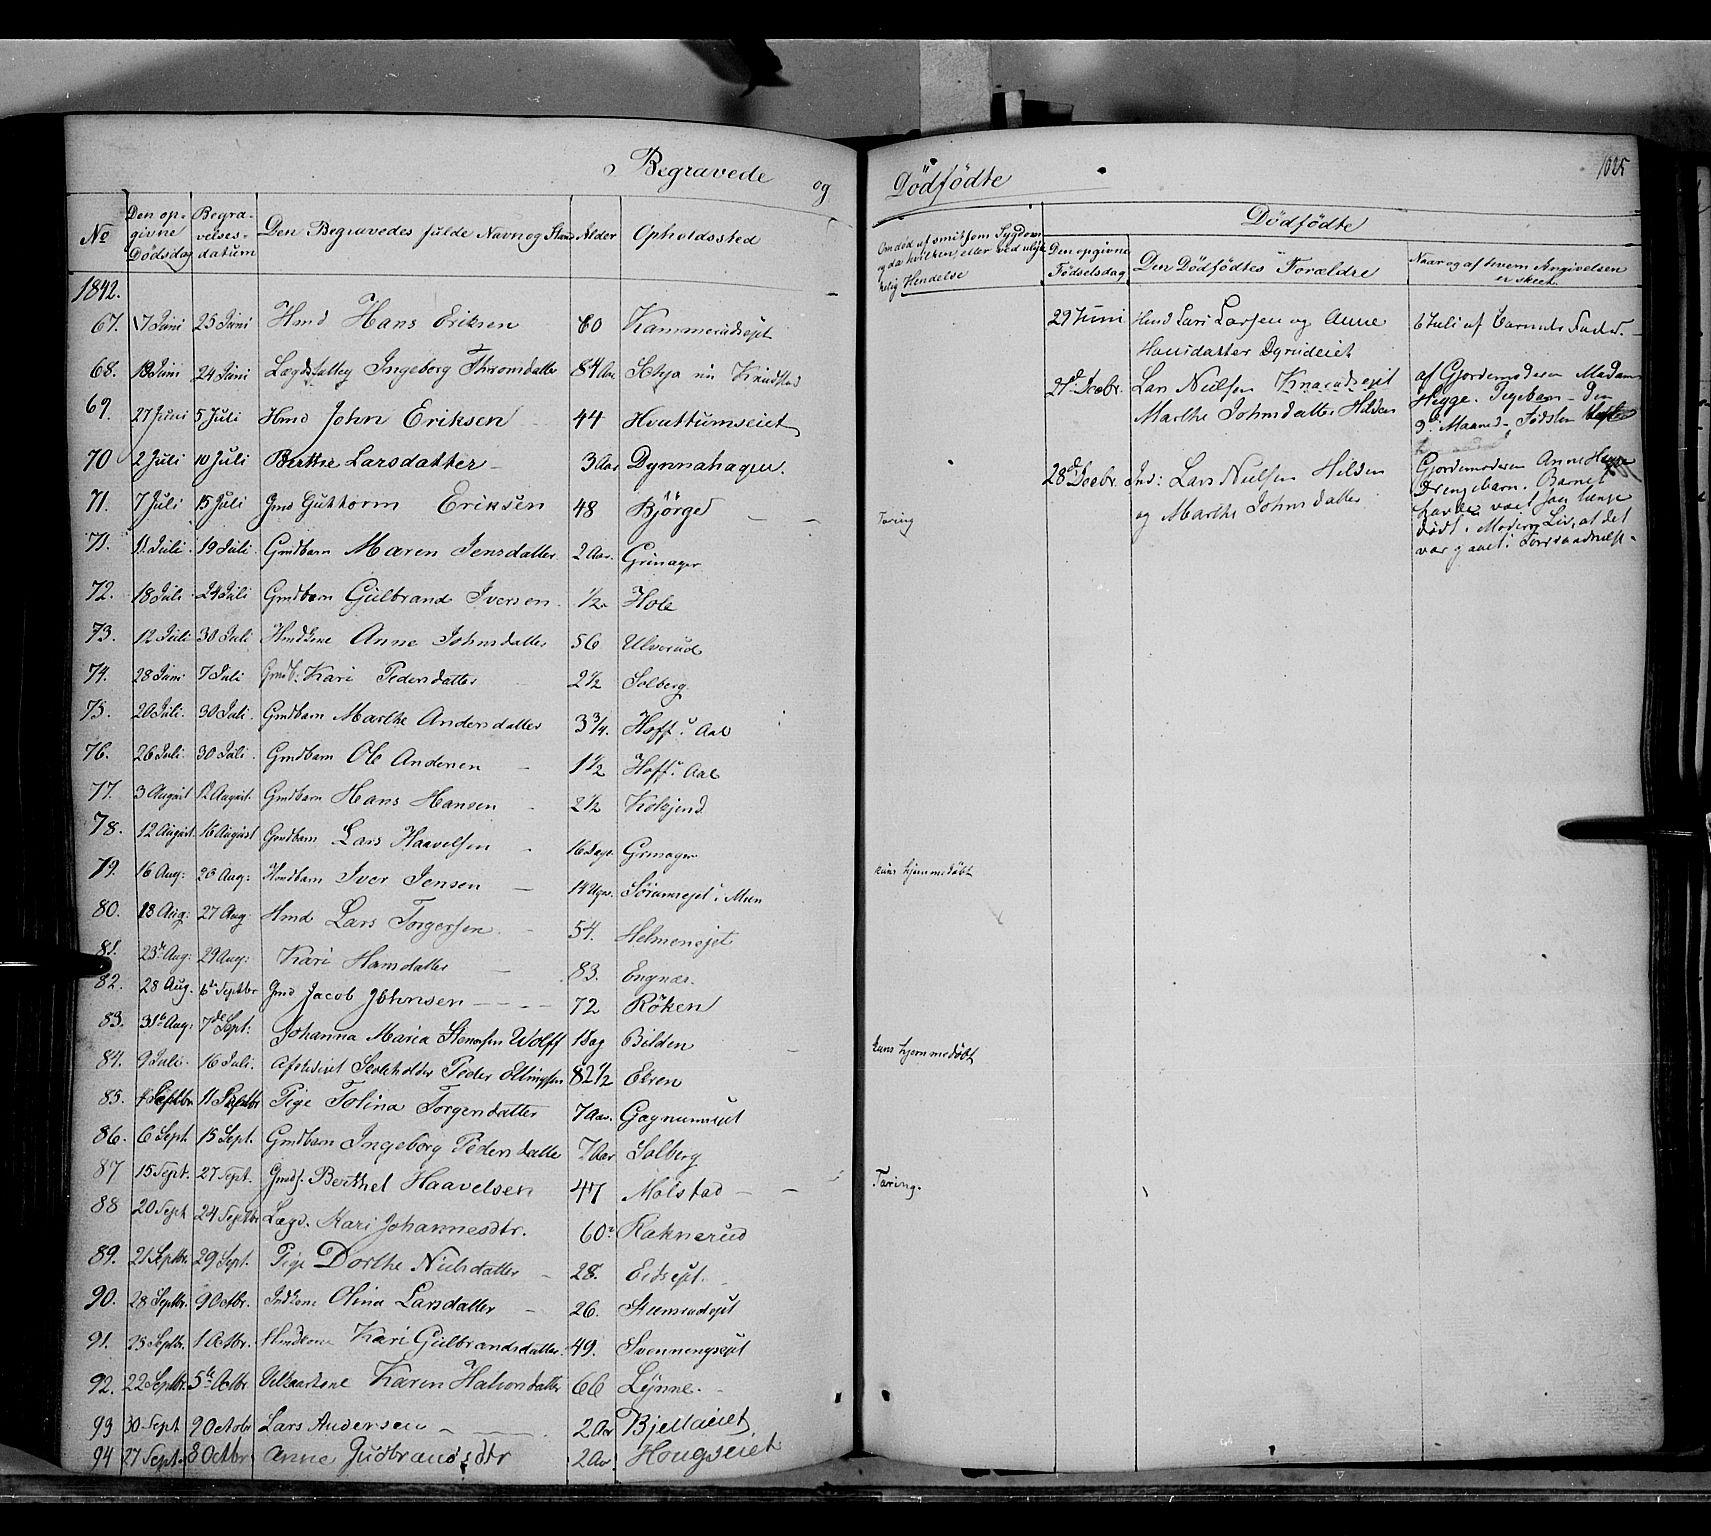 SAH, Gran prestekontor, Ministerialbok nr. 11, 1842-1856, s. 1024-1025